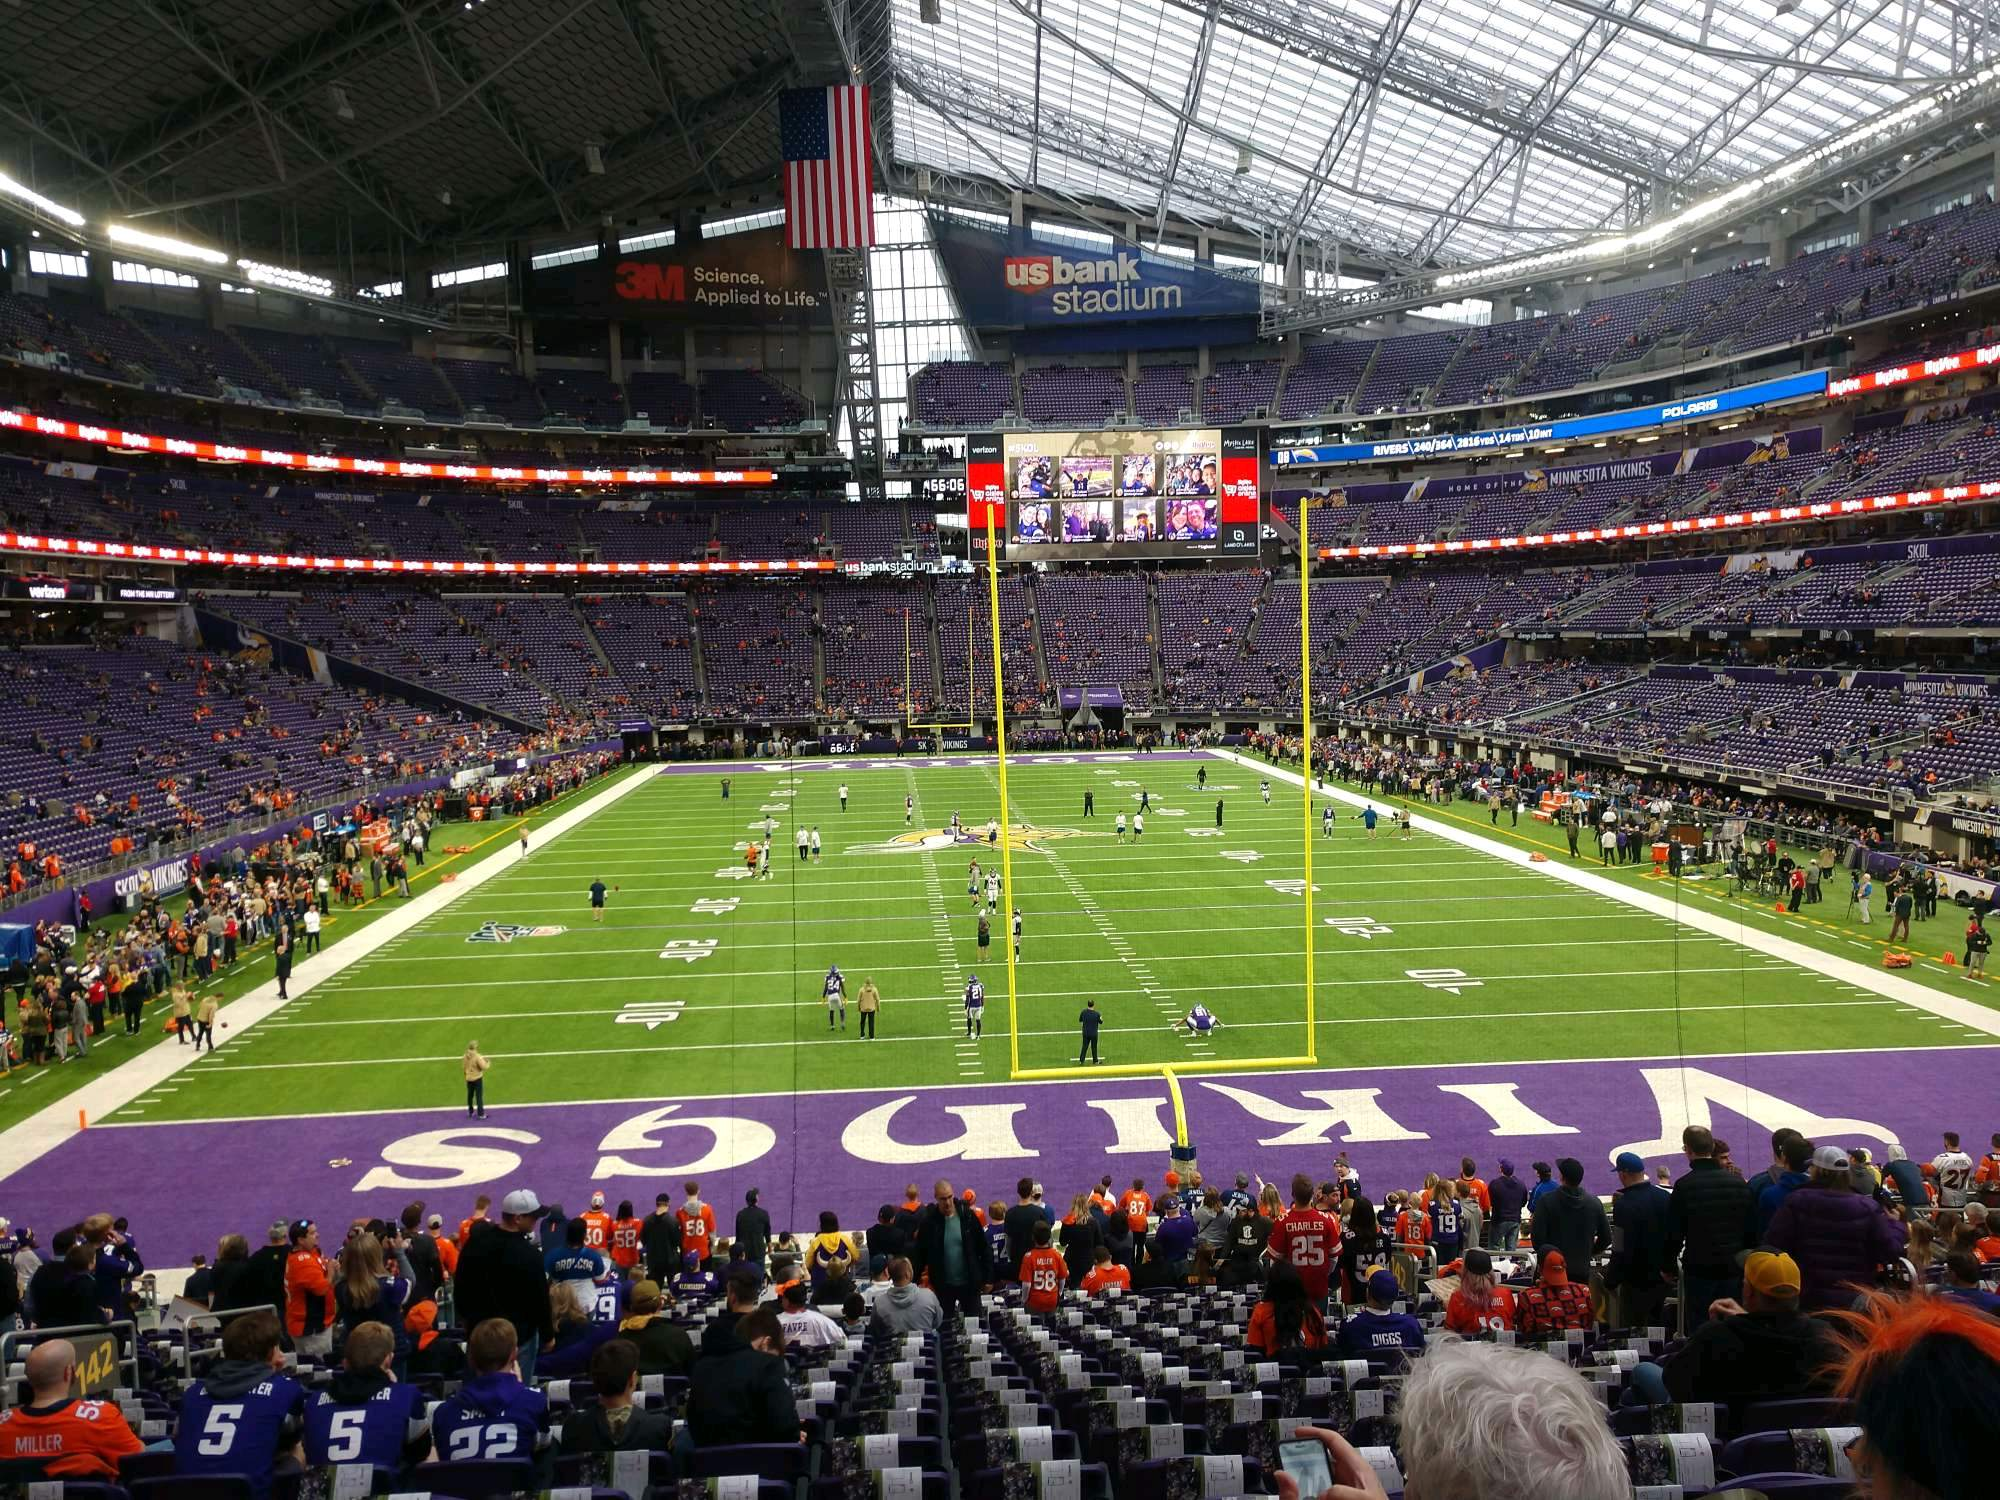 U.S. Bank Stadium Section 142 Row 25 Seat 11